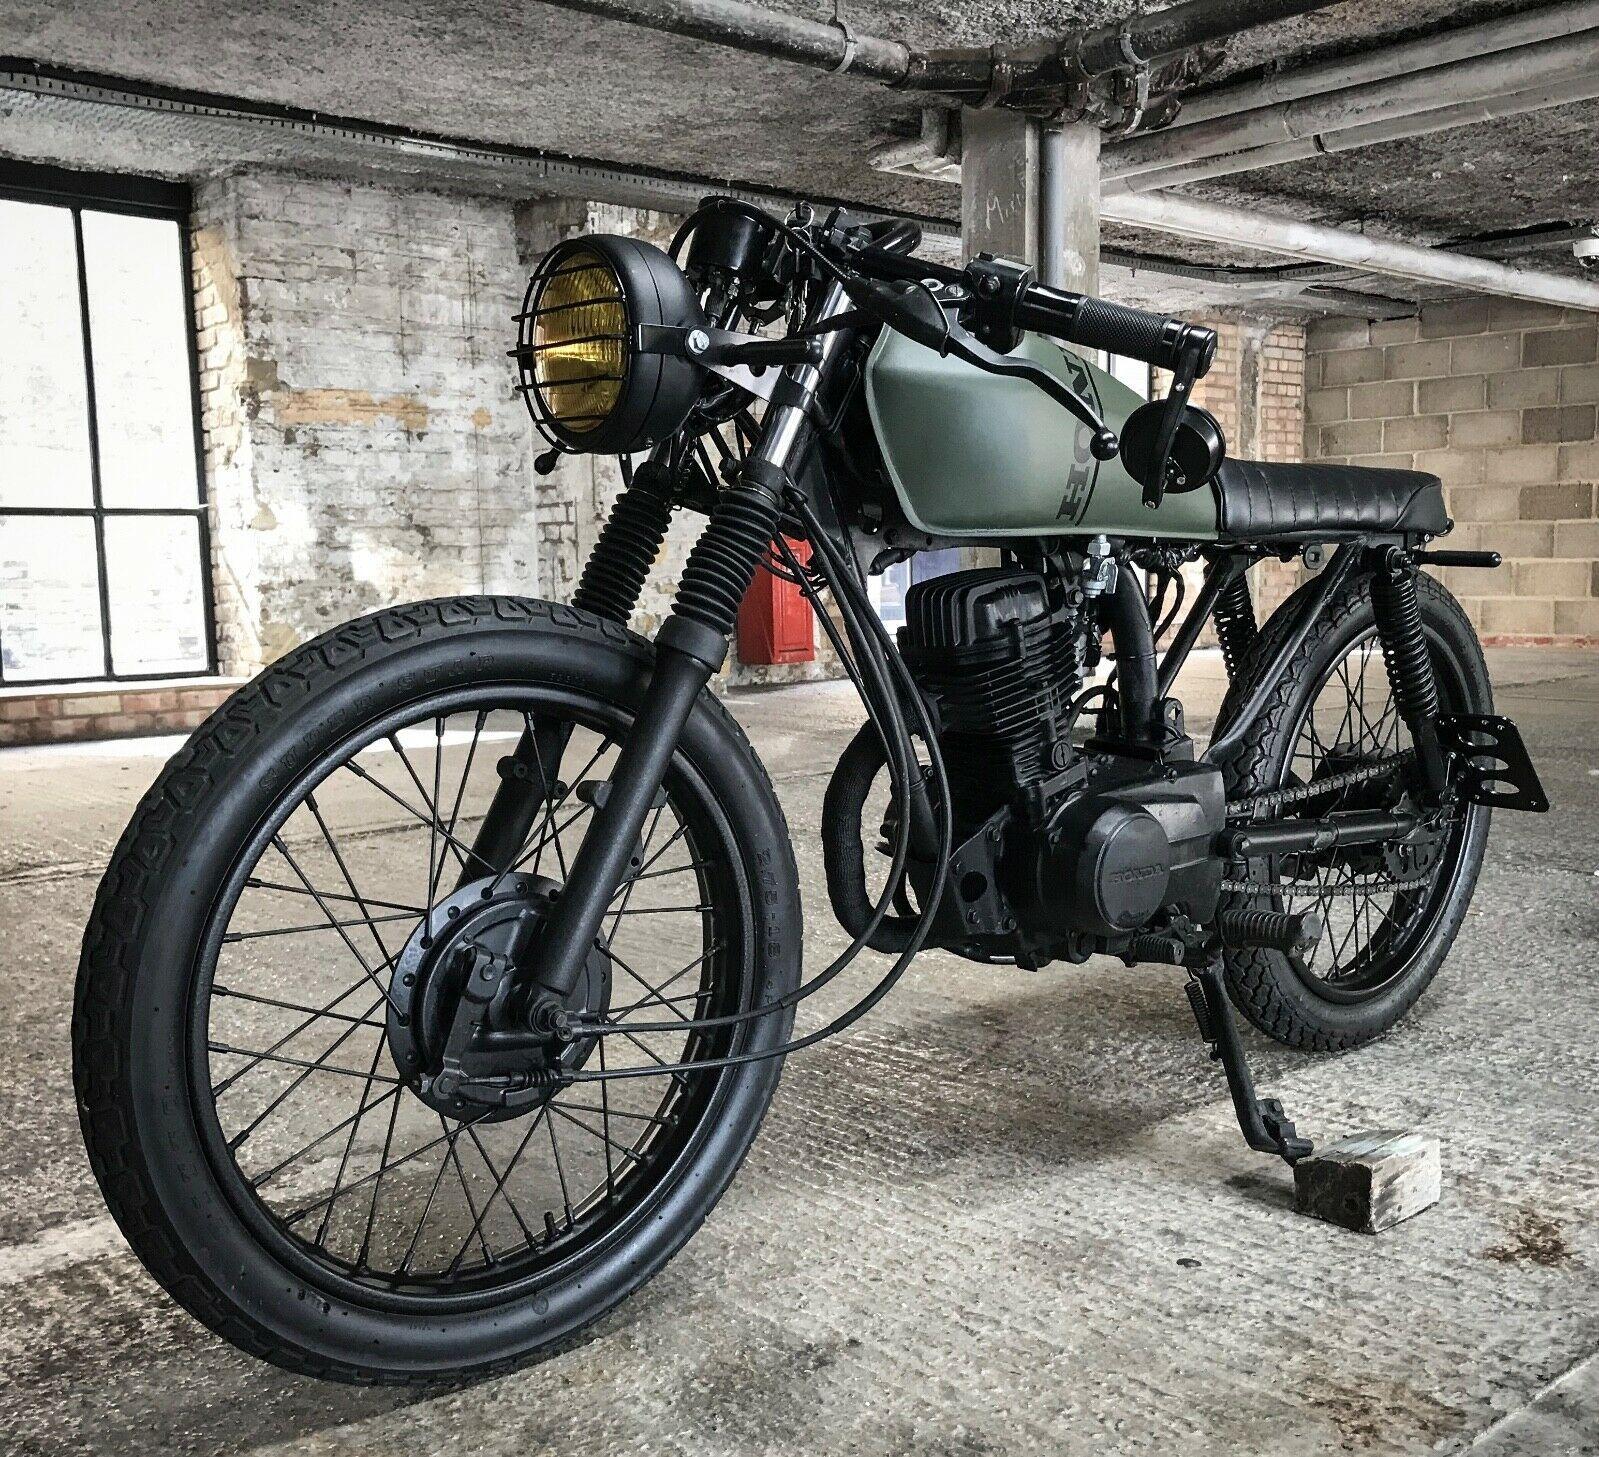 Honda CG 125 Custom Cafe racer / Brat bike | Custom bikes